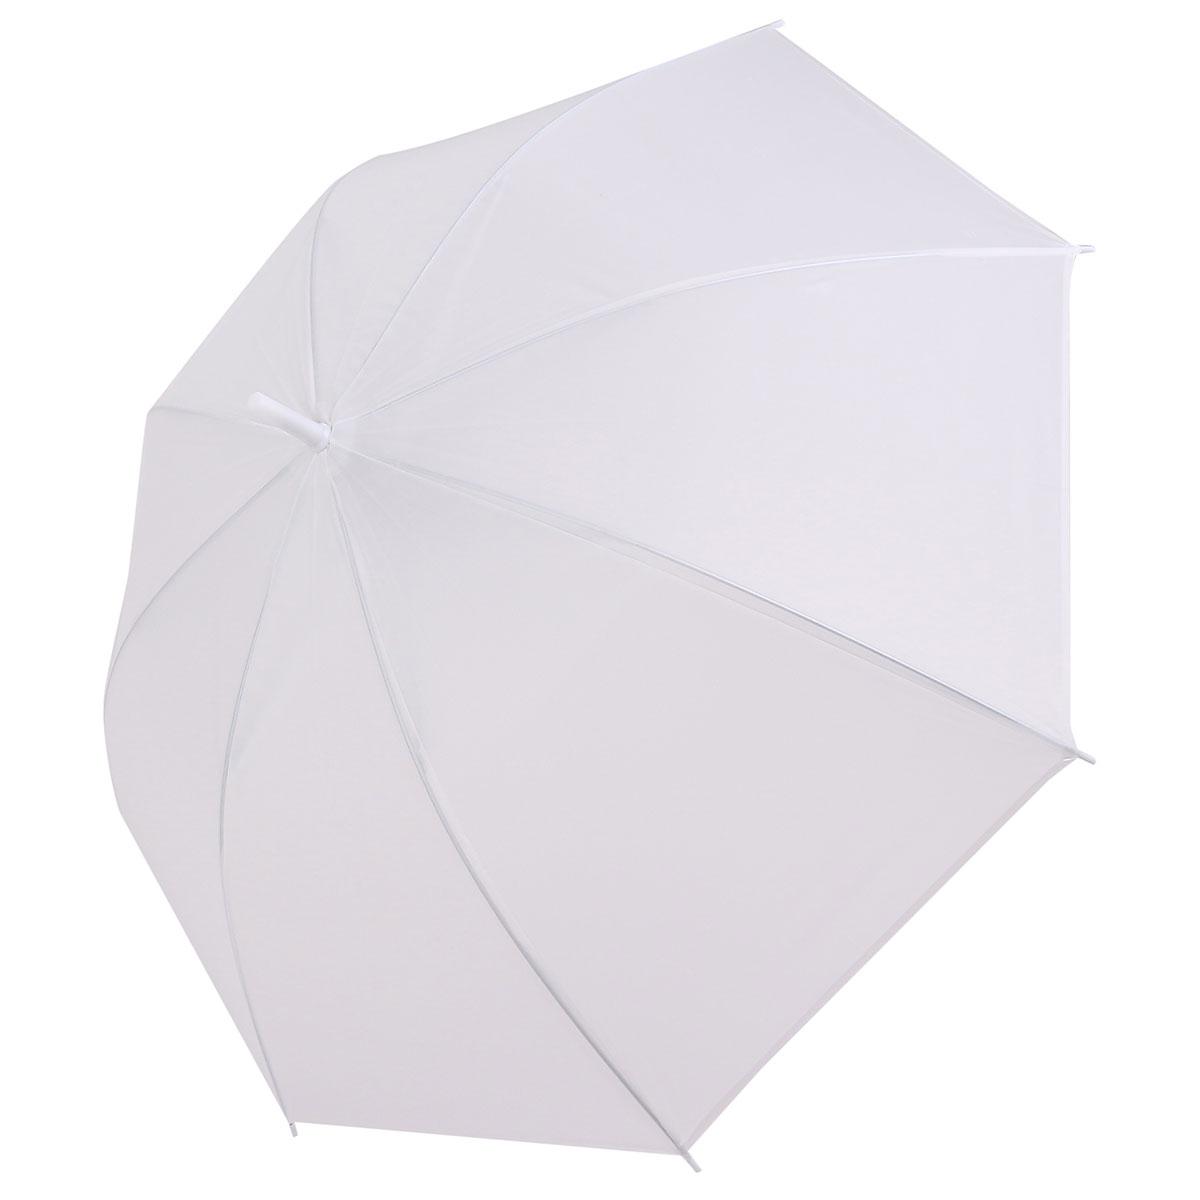 Dome White Transparent Umbrella Large Clear Scrub Parasol Sun Rain for Ladies Wedding